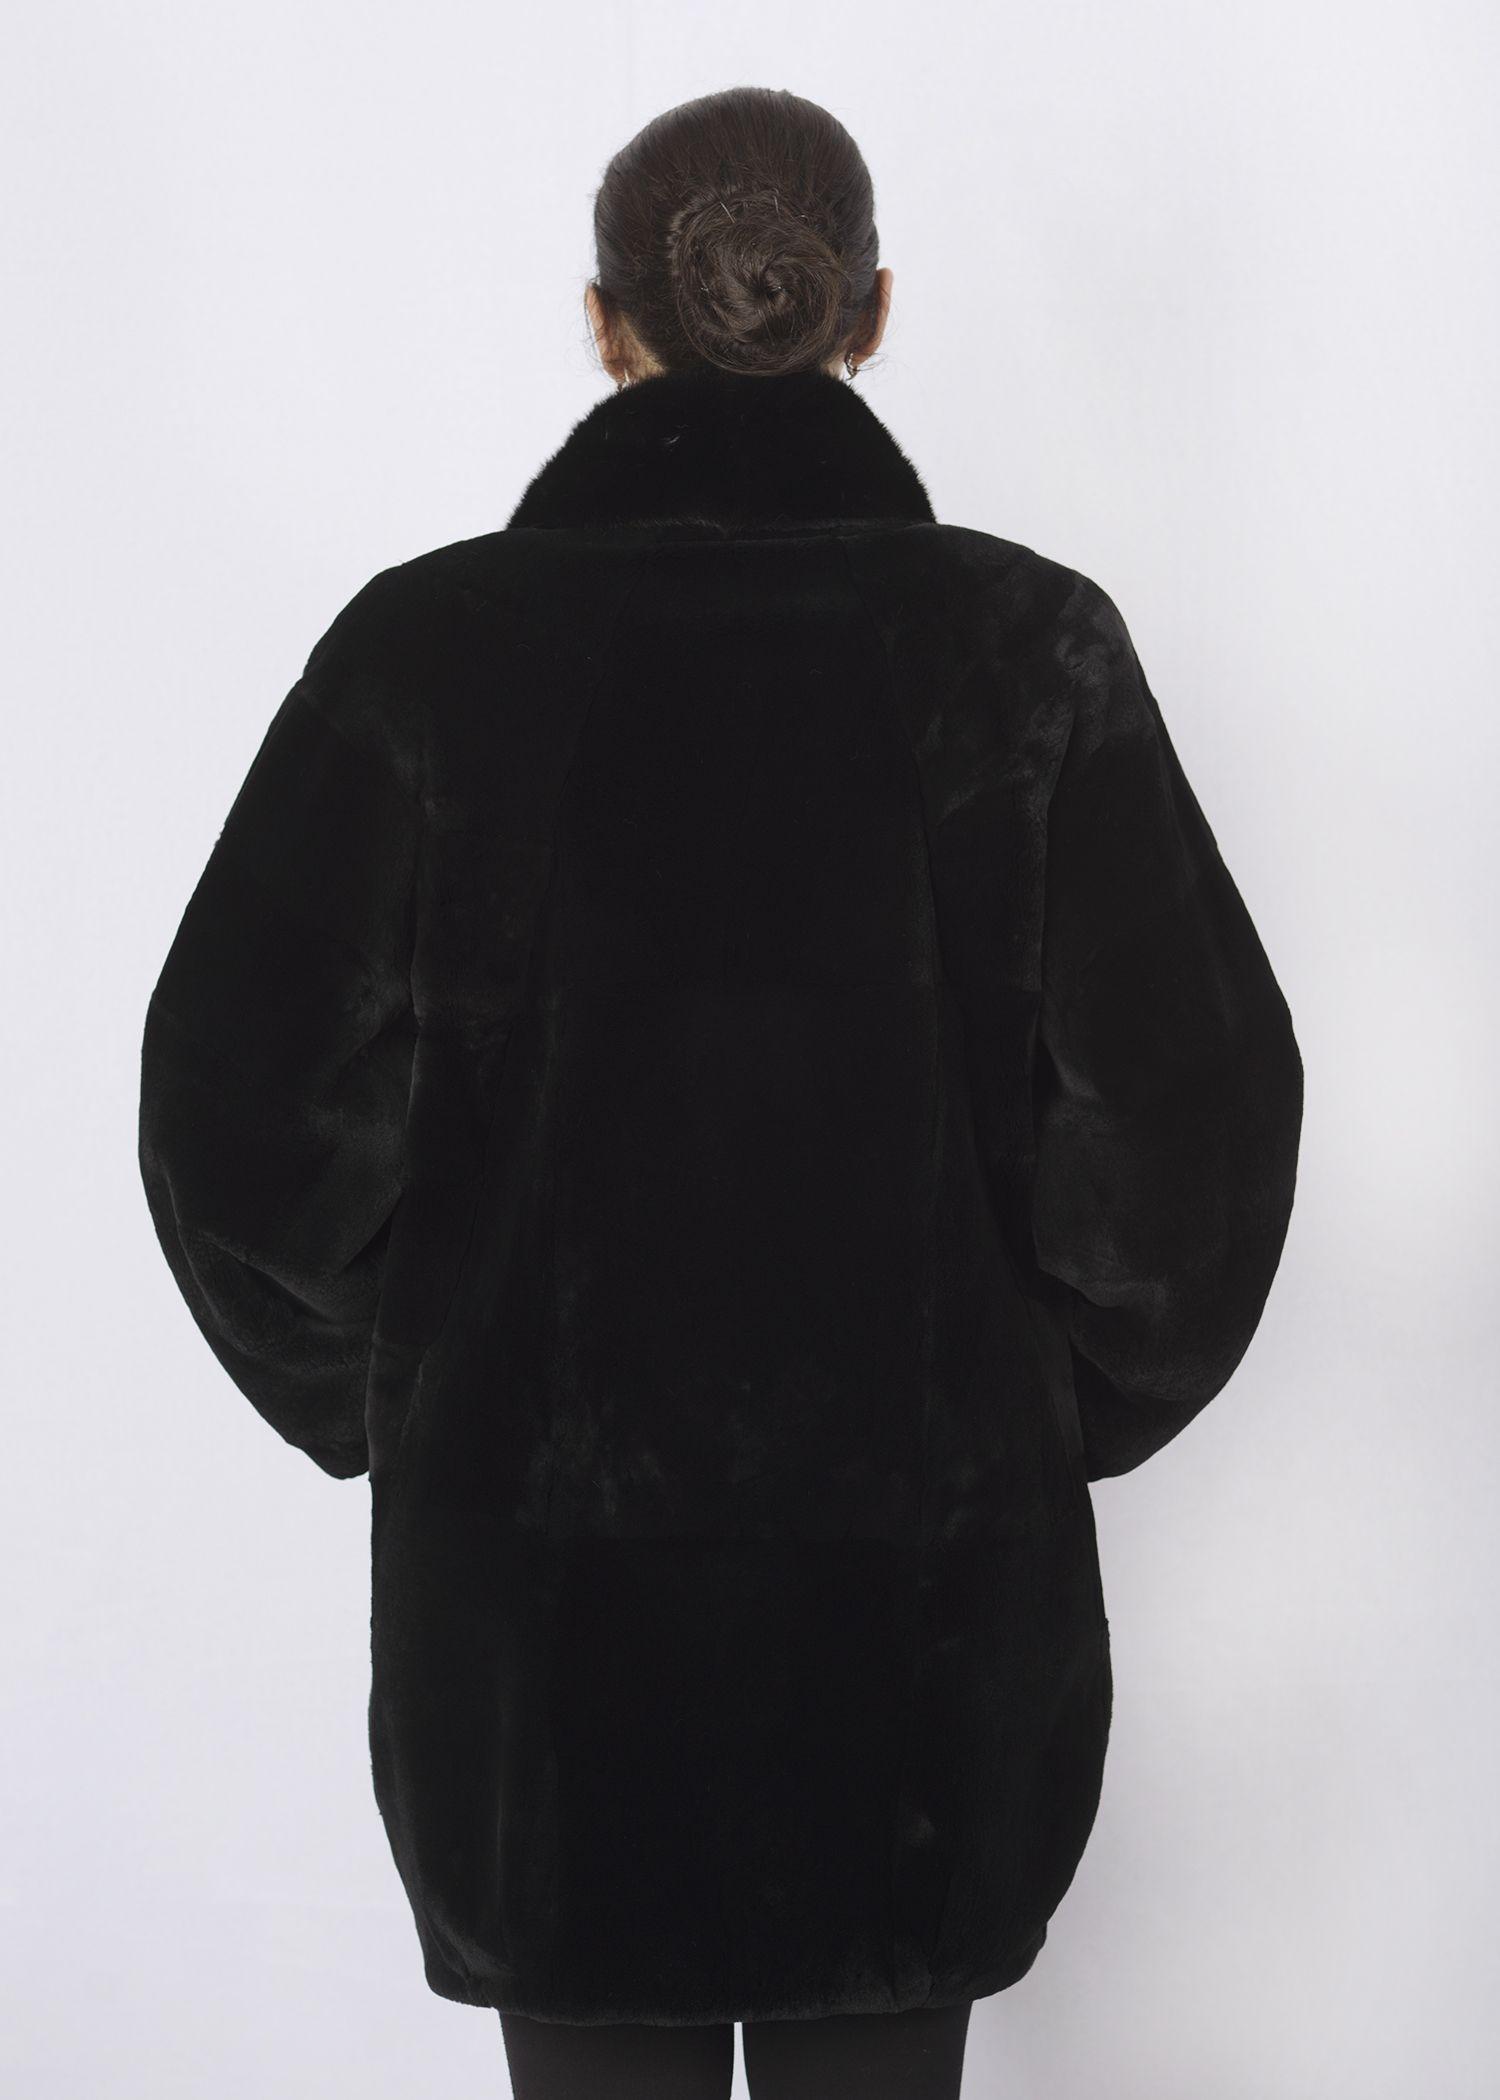 Шуба женская из бобрика(rex) WT06803 фото №1